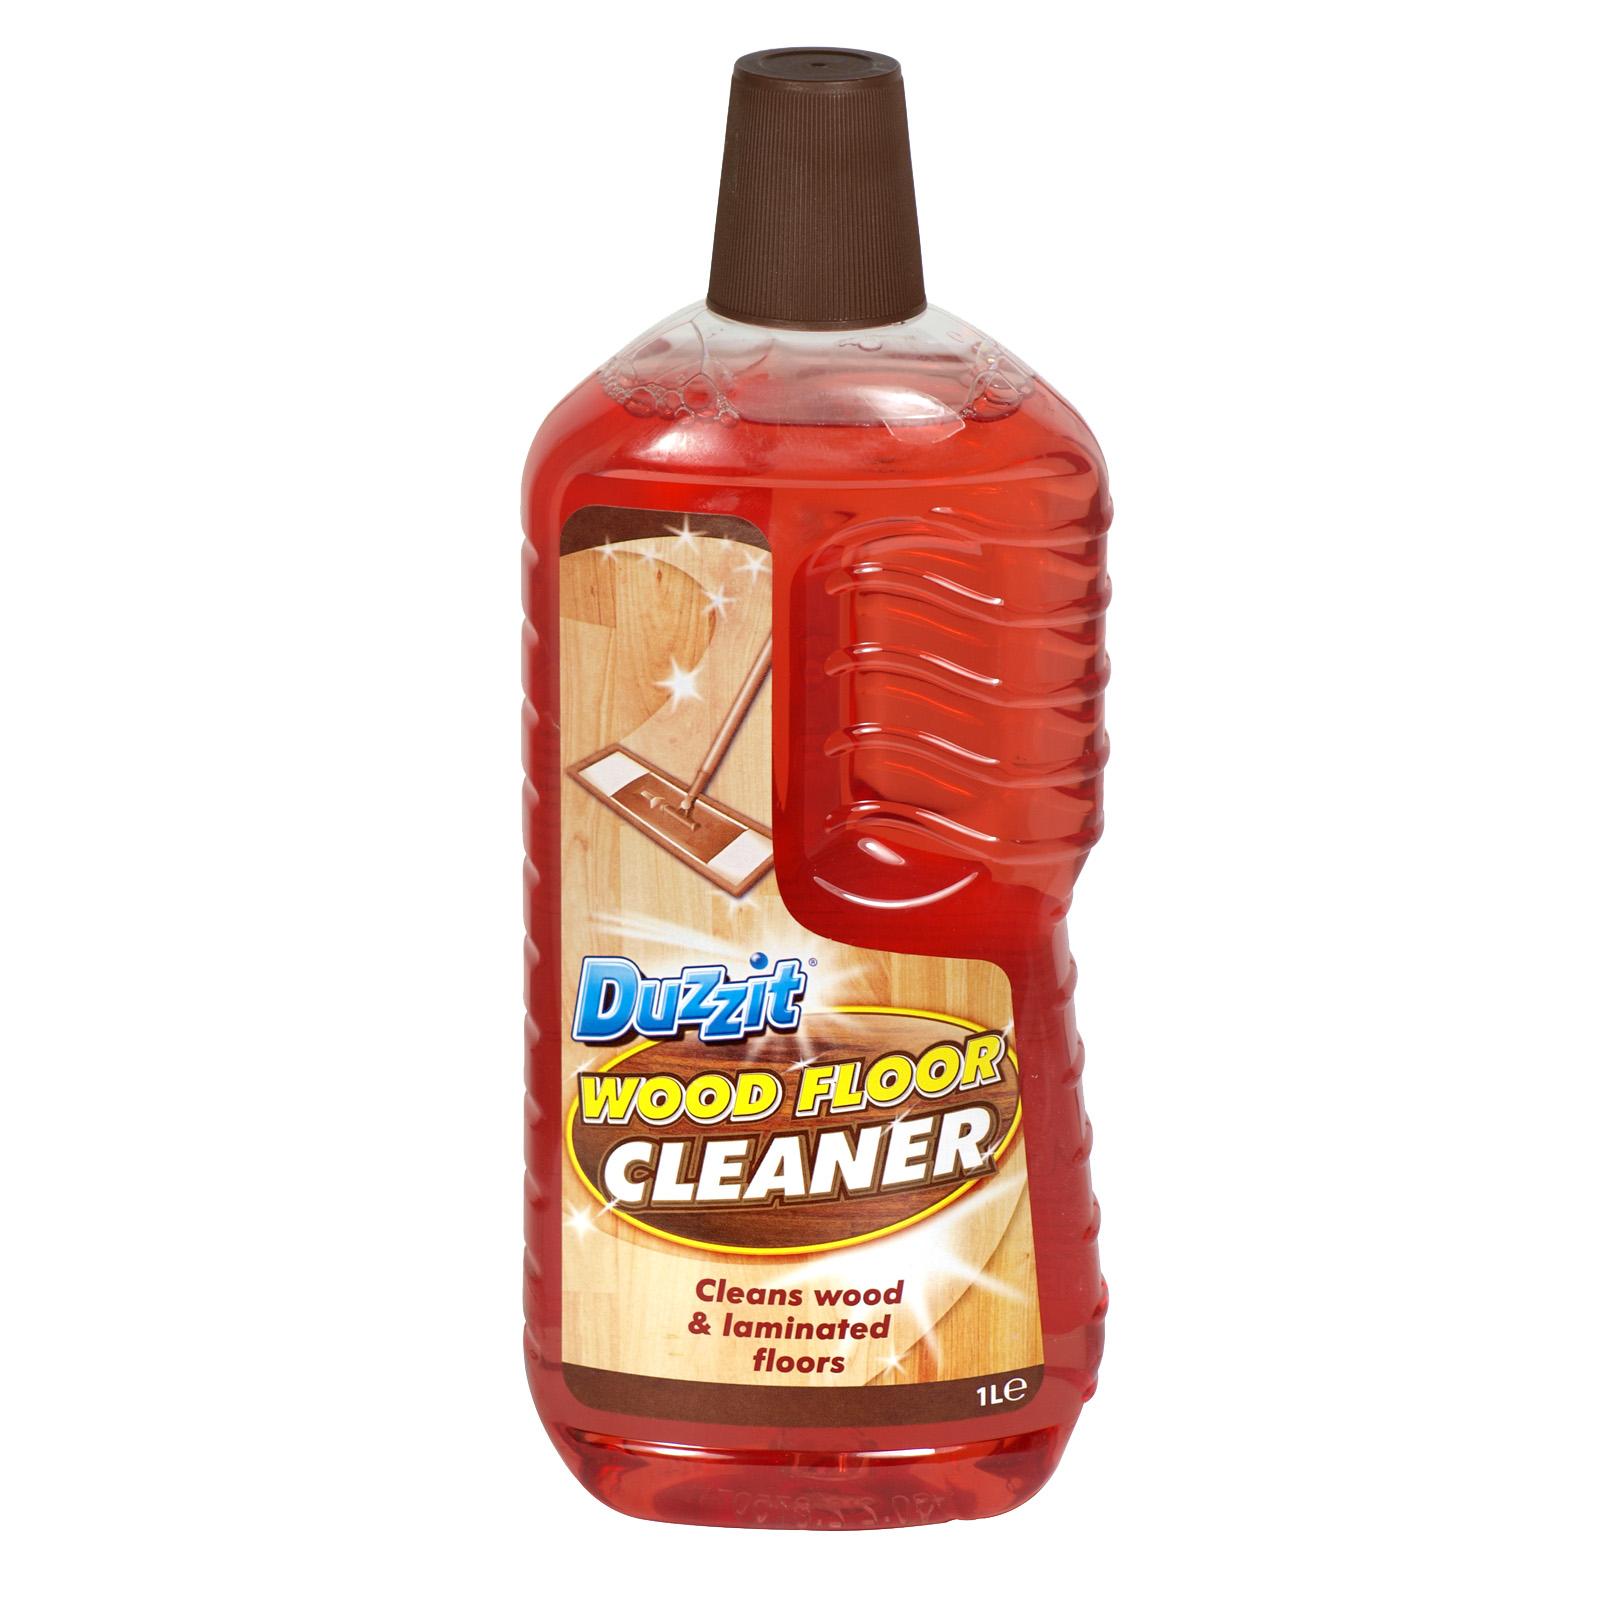 DUZZIT WOOD FLOOR CLEANER 1L X12